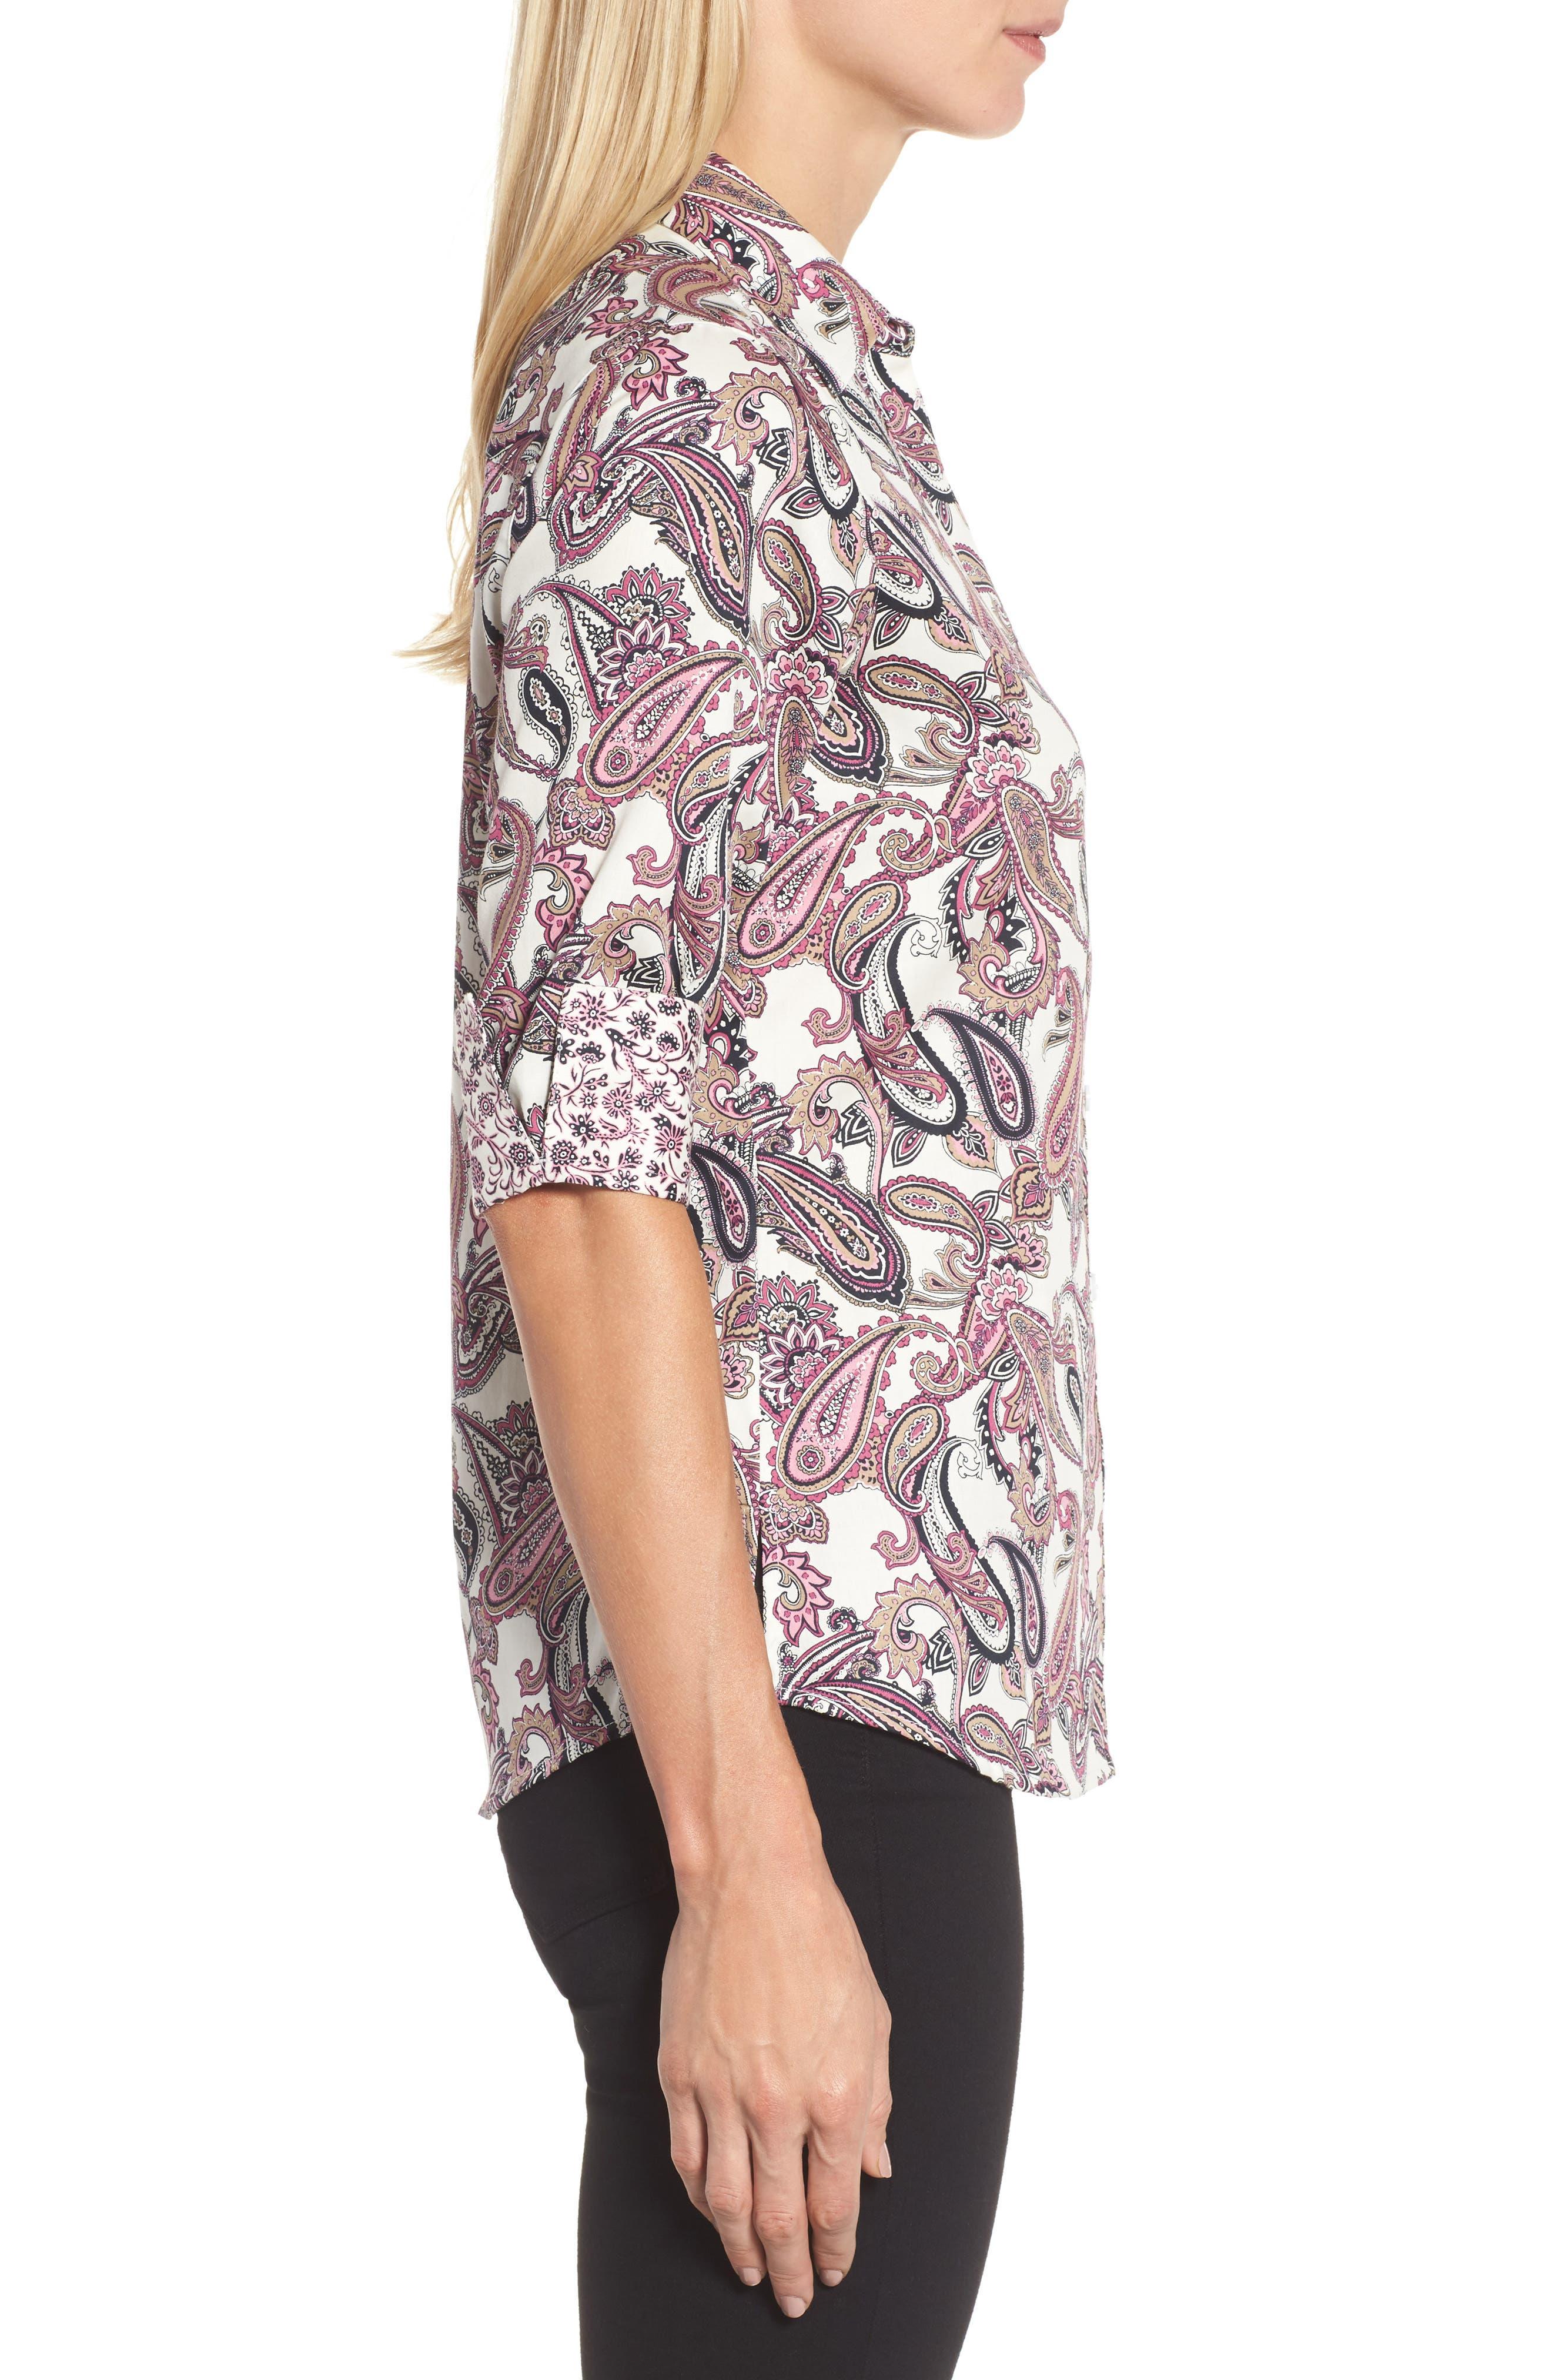 Mary Paisley Wrinkle Free Shirt,                             Alternate thumbnail 3, color,                             935